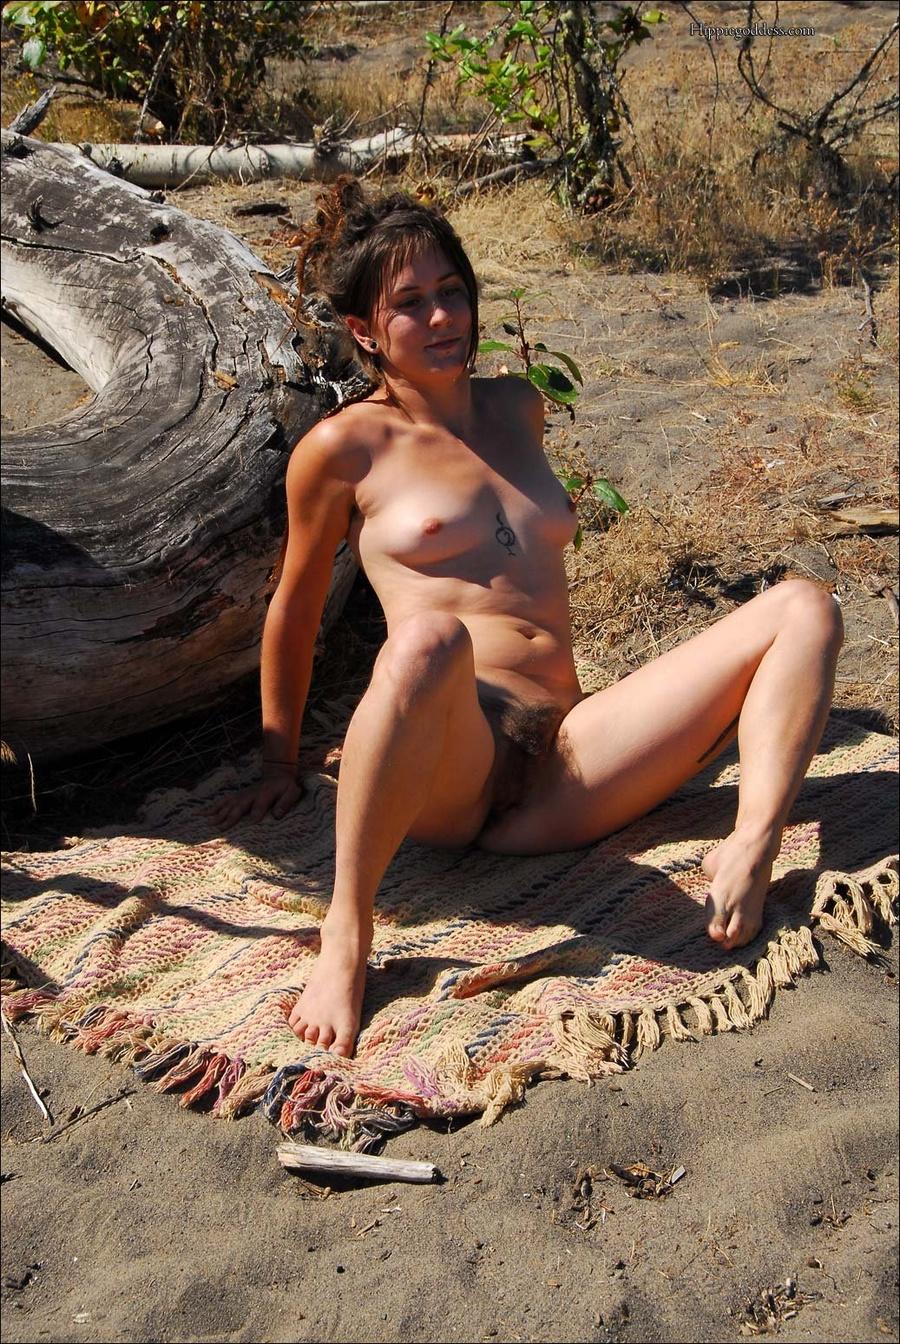 Xxx nudist beach